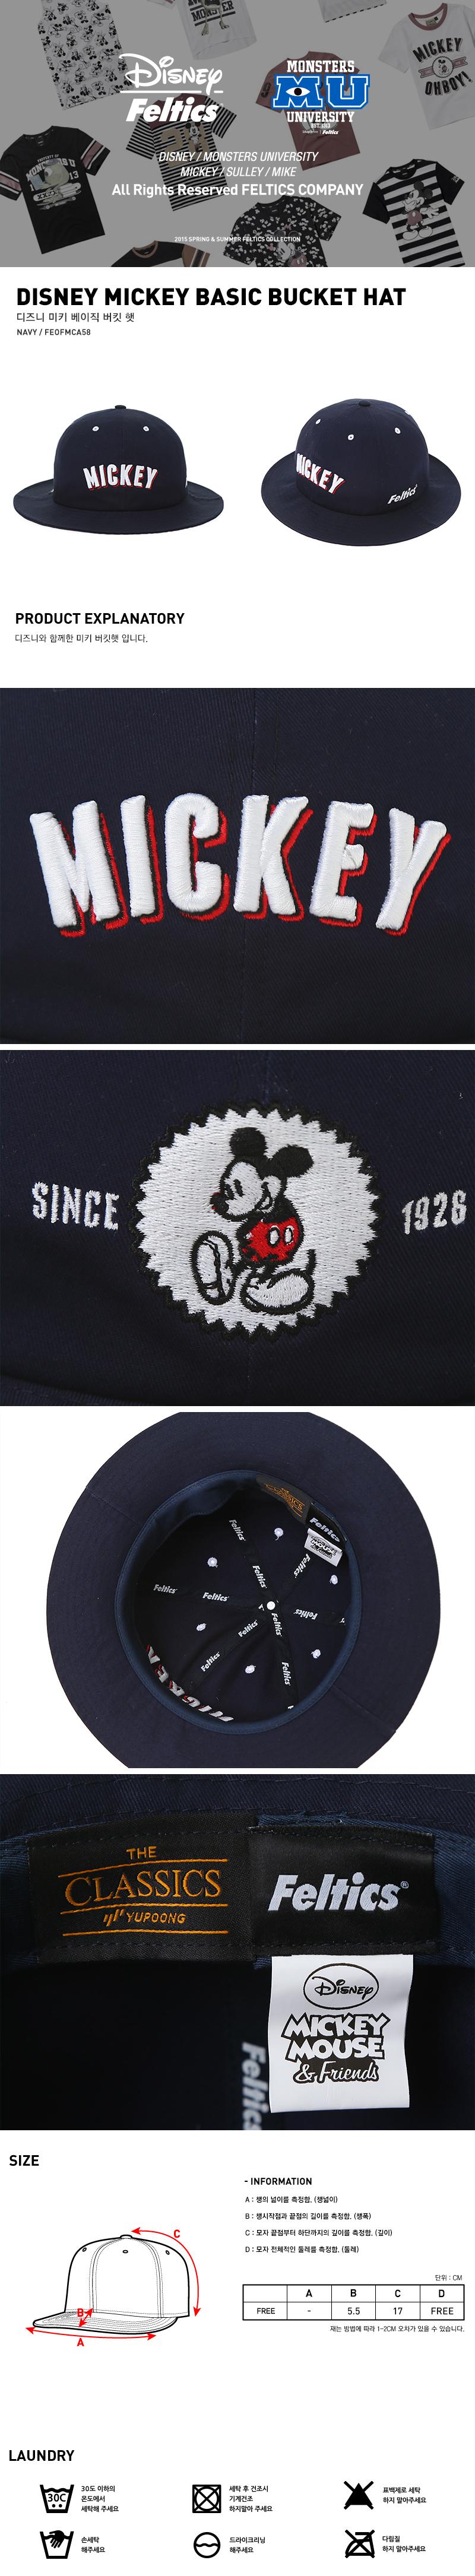 [ FELTICS ] [ FELTICS ]米奇老鼠基本铲斗帽海军(FEOFMCA58)